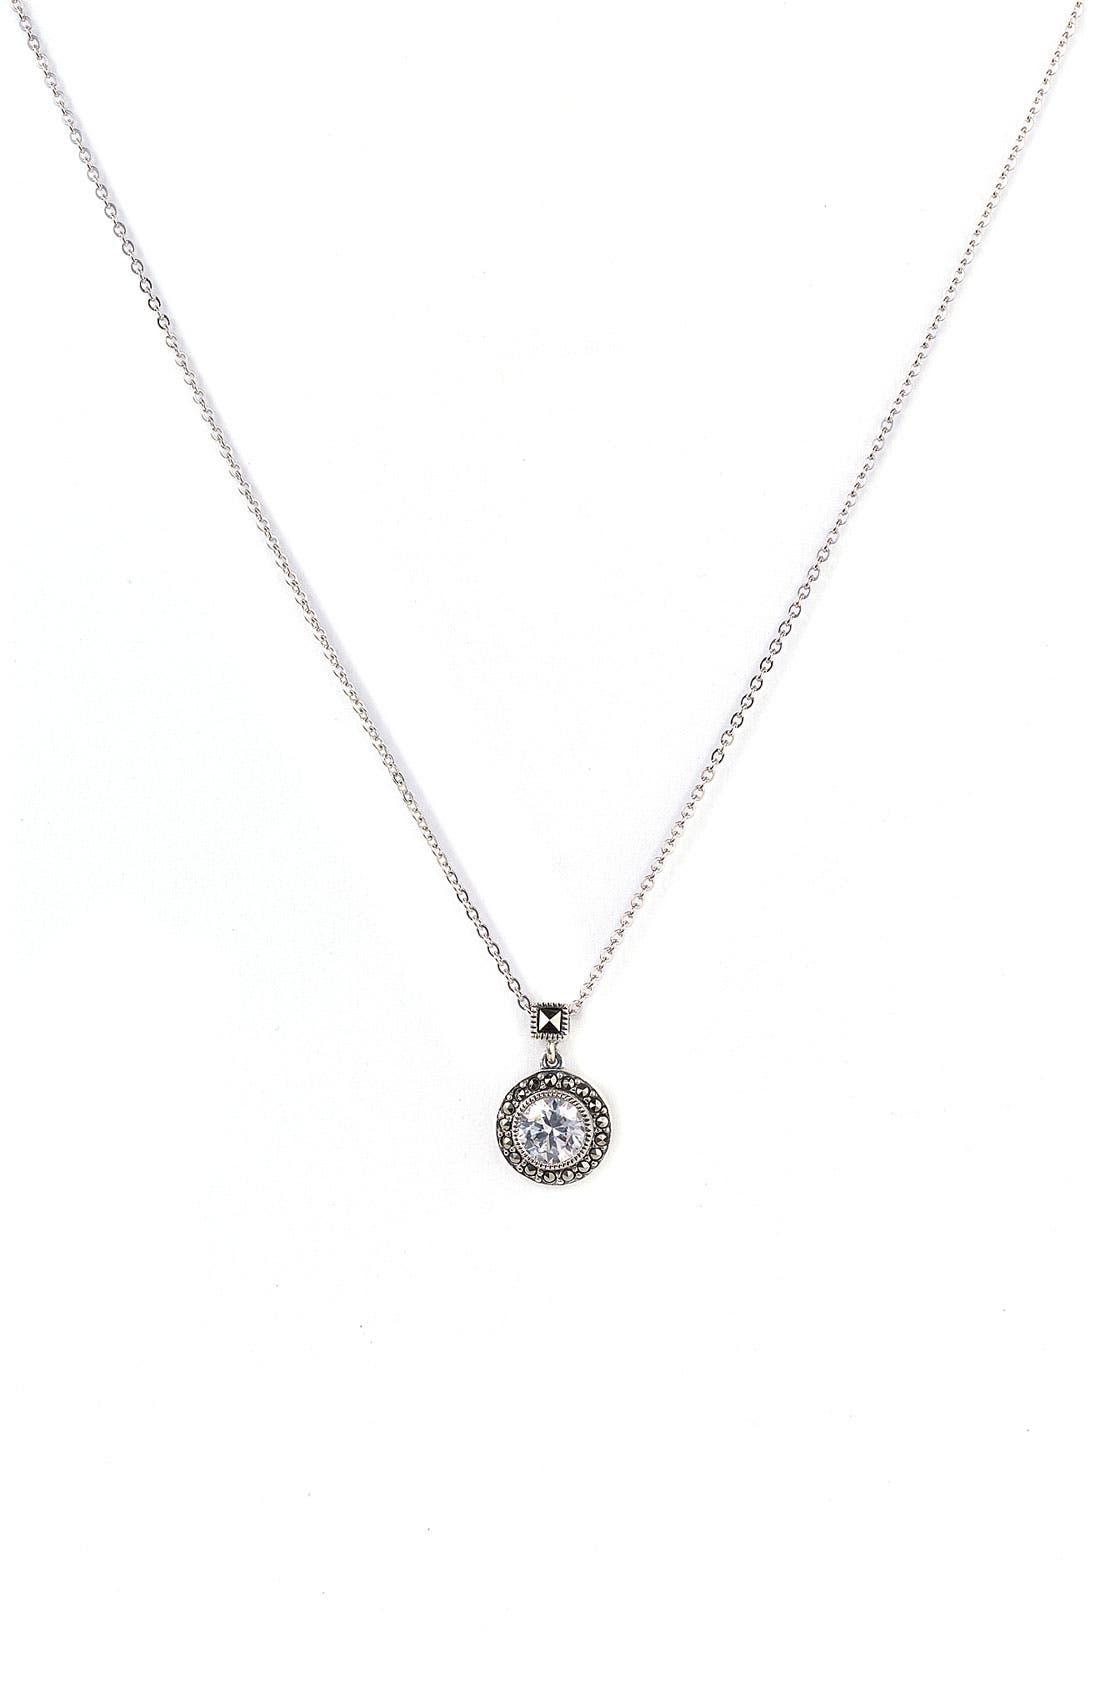 Main Image - Judith Jack 'Small Moonshadow' Necklace